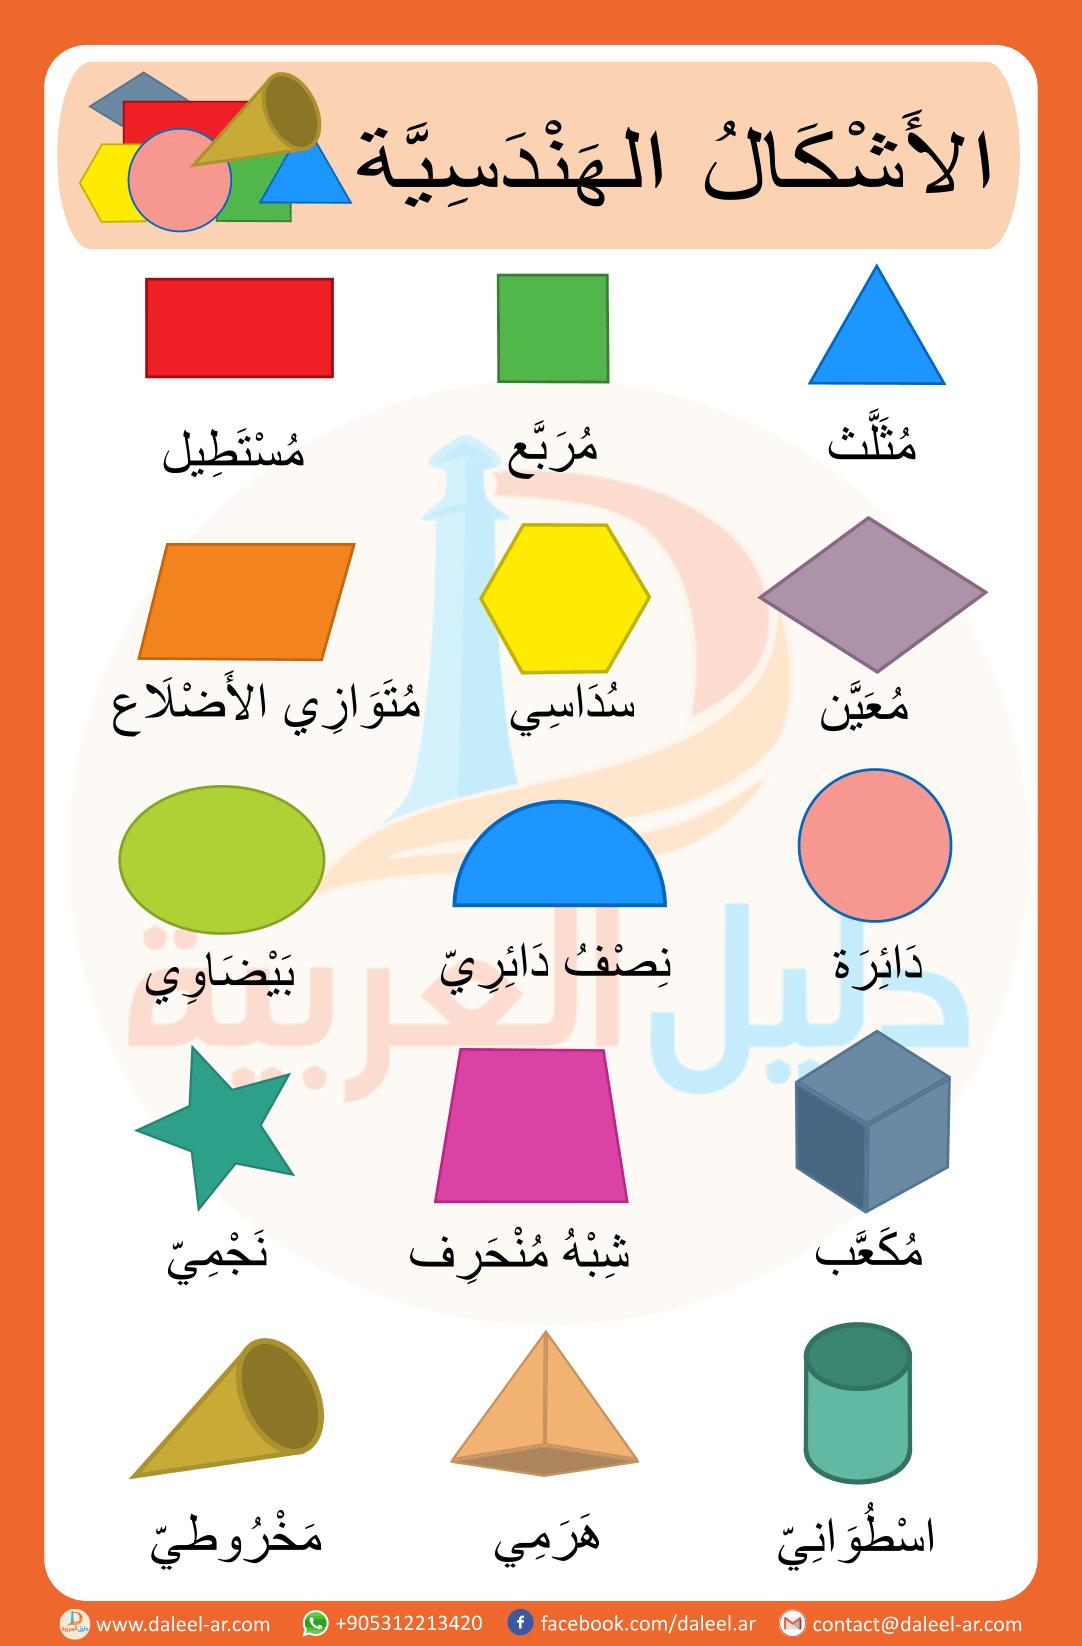 Course Miscellaneous Topics Section Geometric Shapes In Arabic Learn Arabic Alphabet Arabic Alphabet Learning Arabic